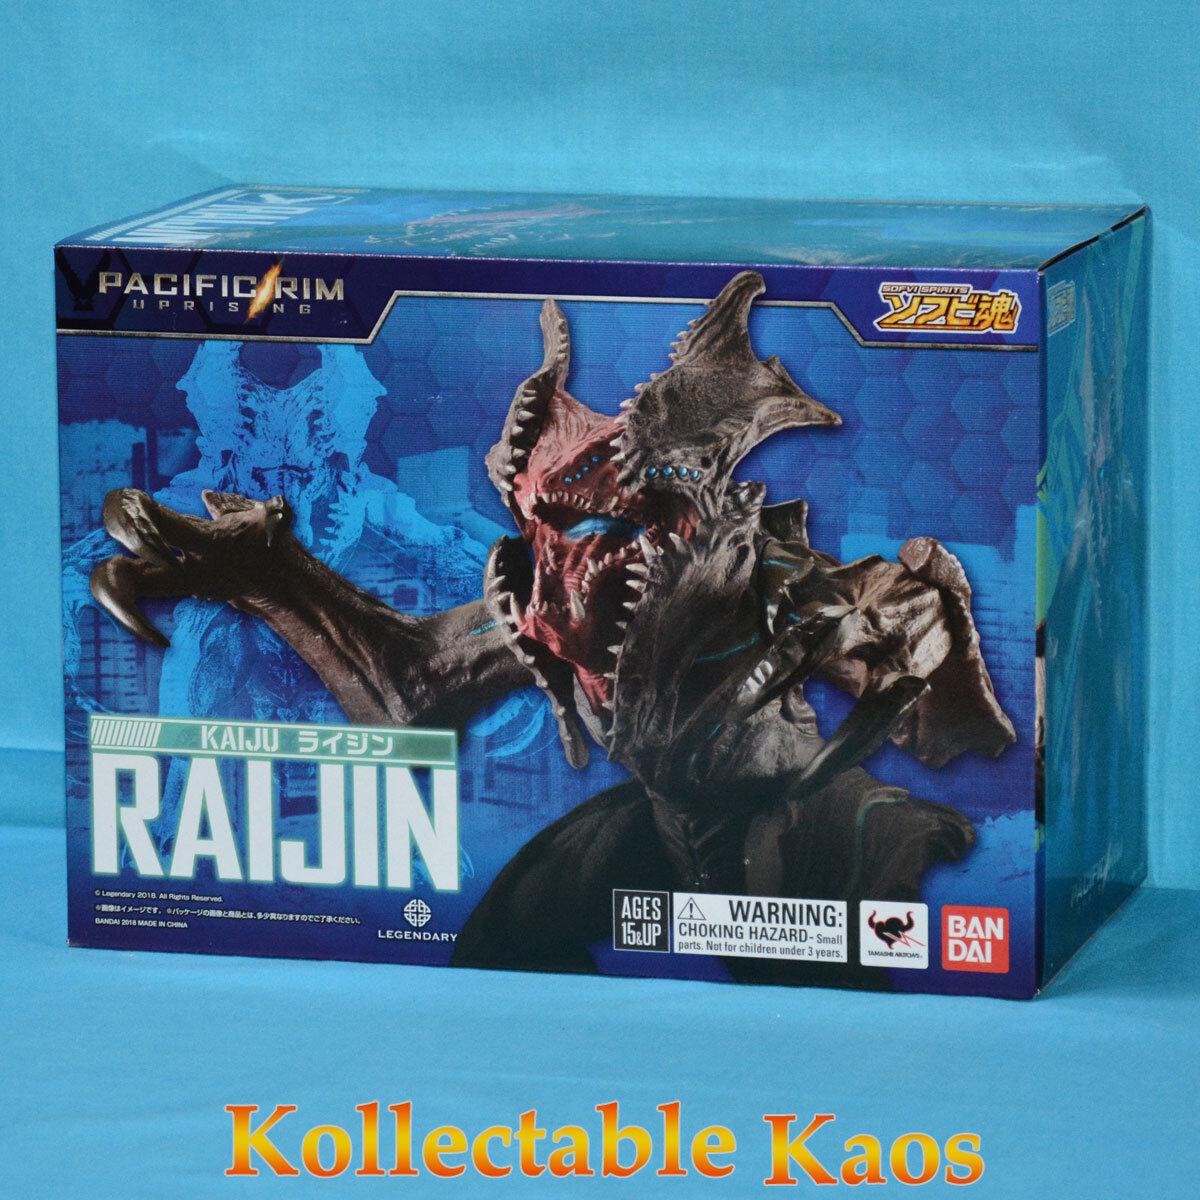 Pacific Rim Rim Rim Uprising - Raijin Action Figure ecdc2a